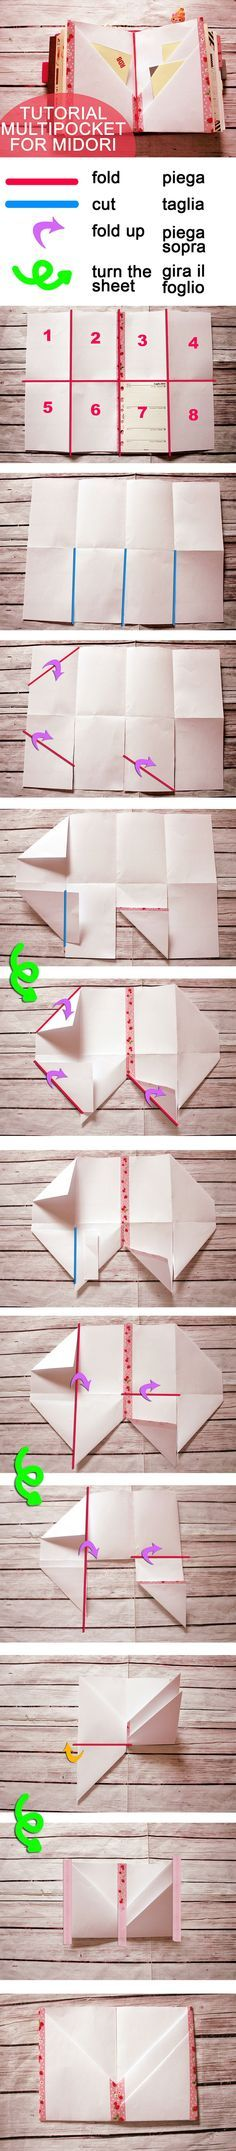 Lucy-Wonderland: tutorial_multipocket for midori or flexdori